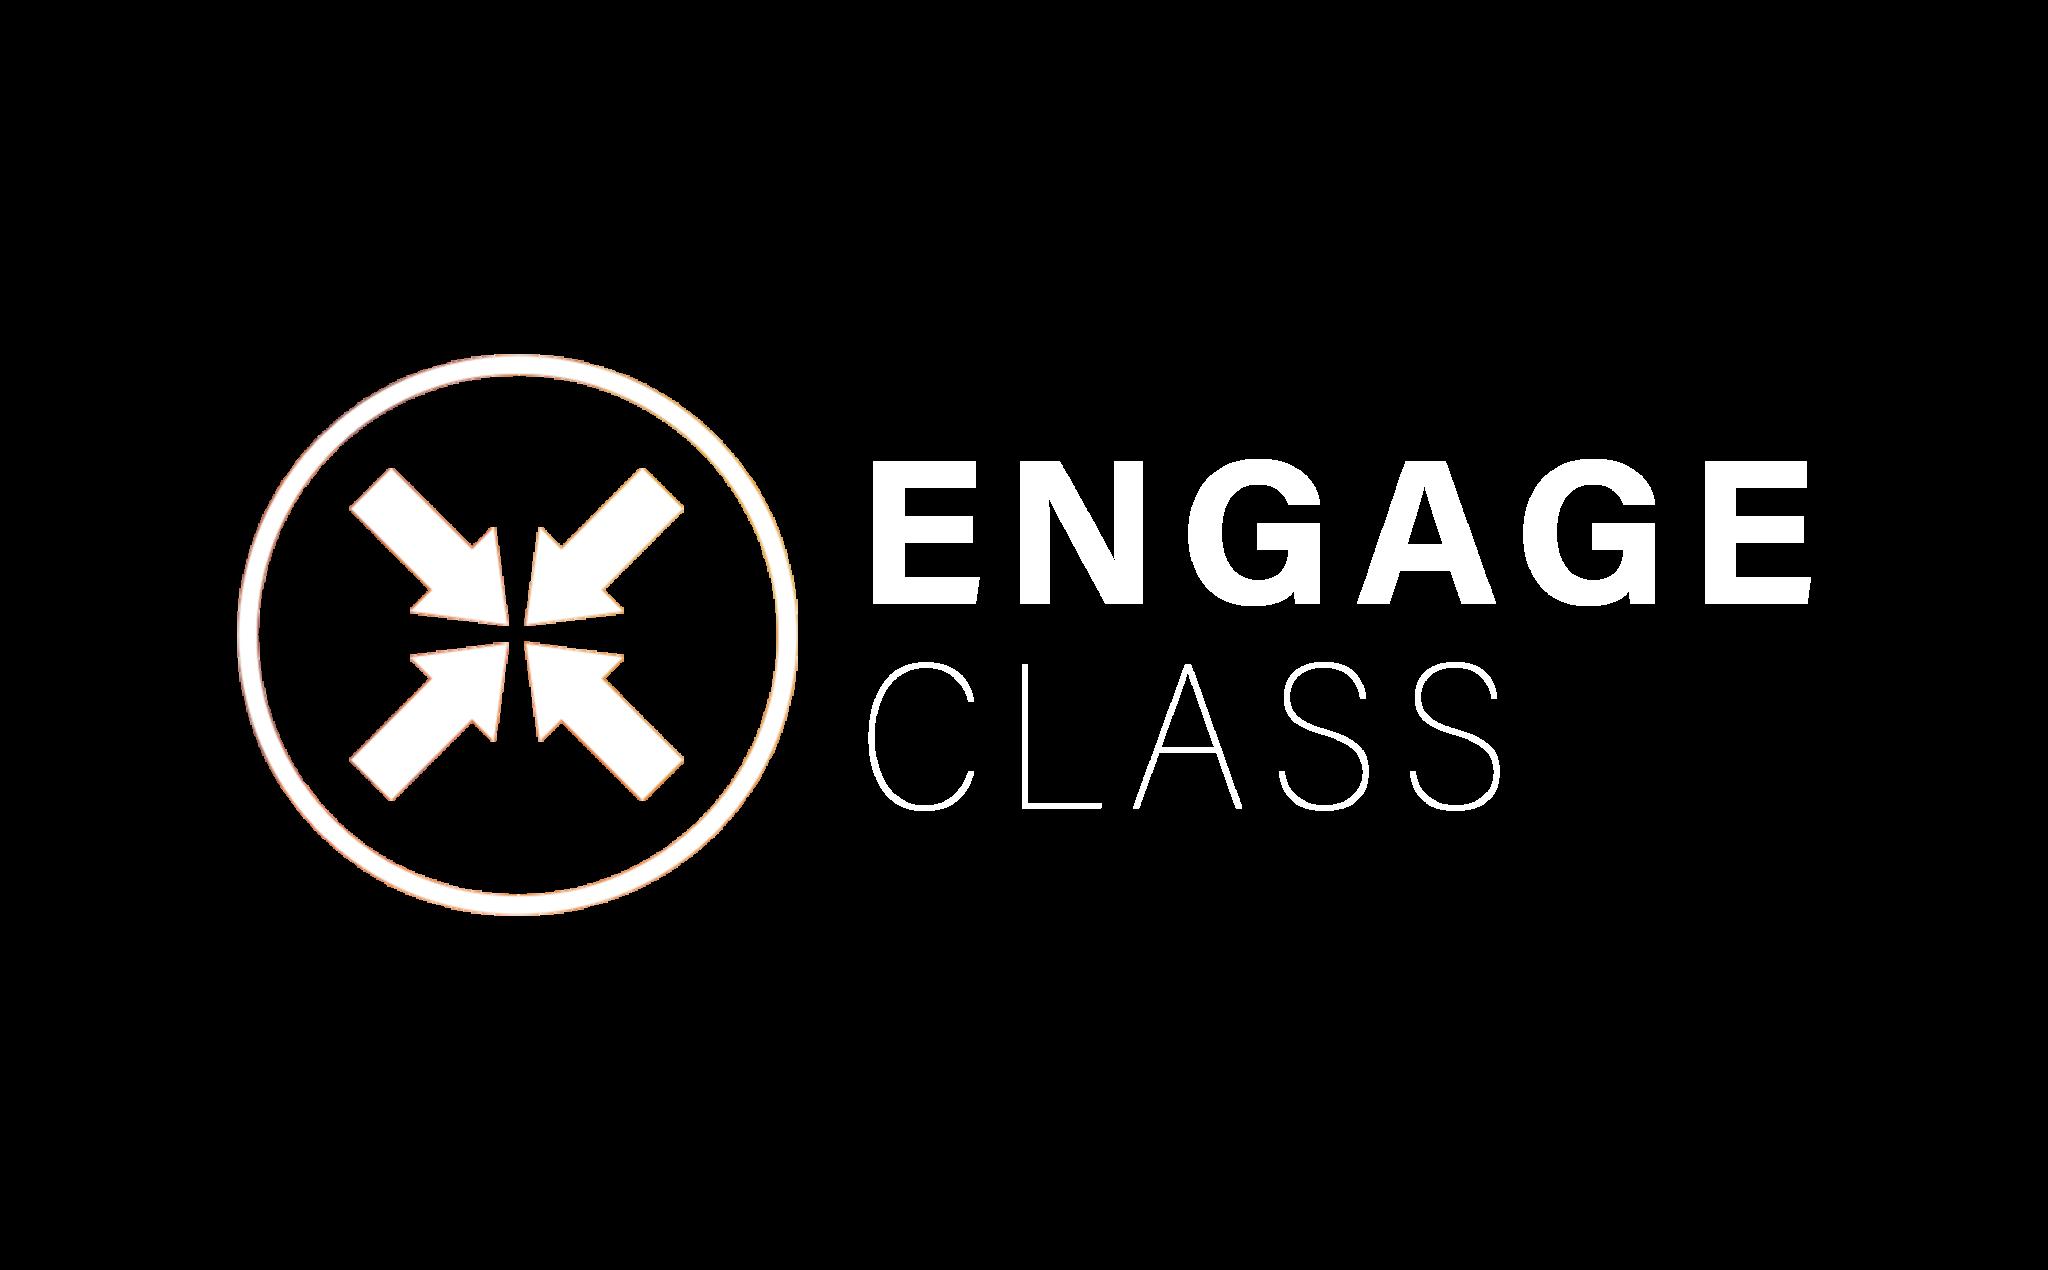 engage without background